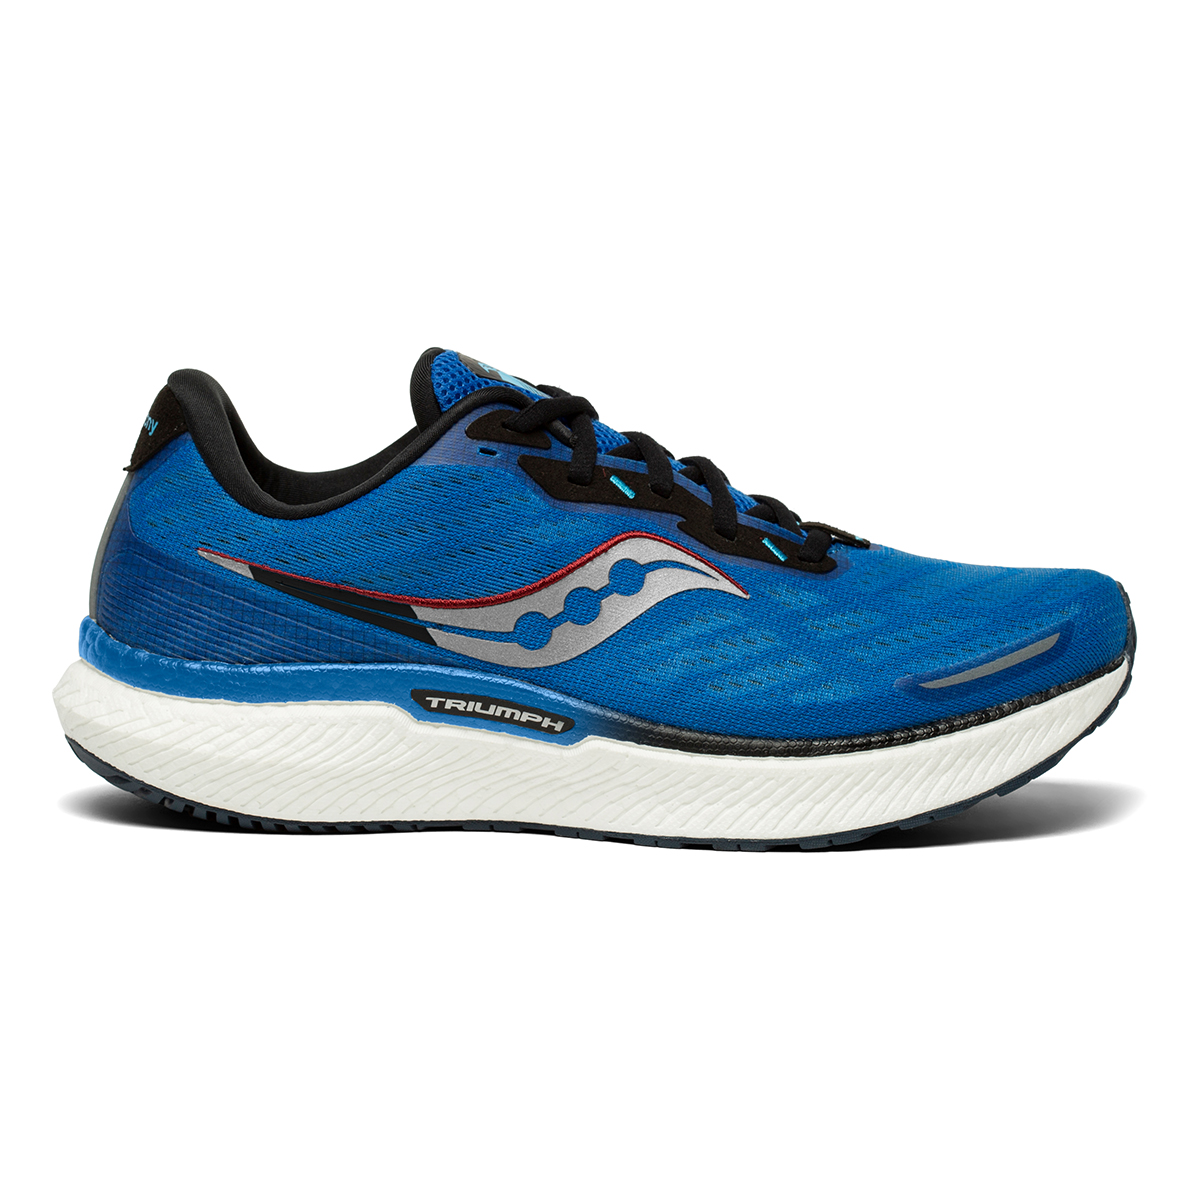 Men's Saucony Triumph 19 Running Shoe - Color: Royal / Space - Size: 7 - Width: Regular, Royal / Space, large, image 1